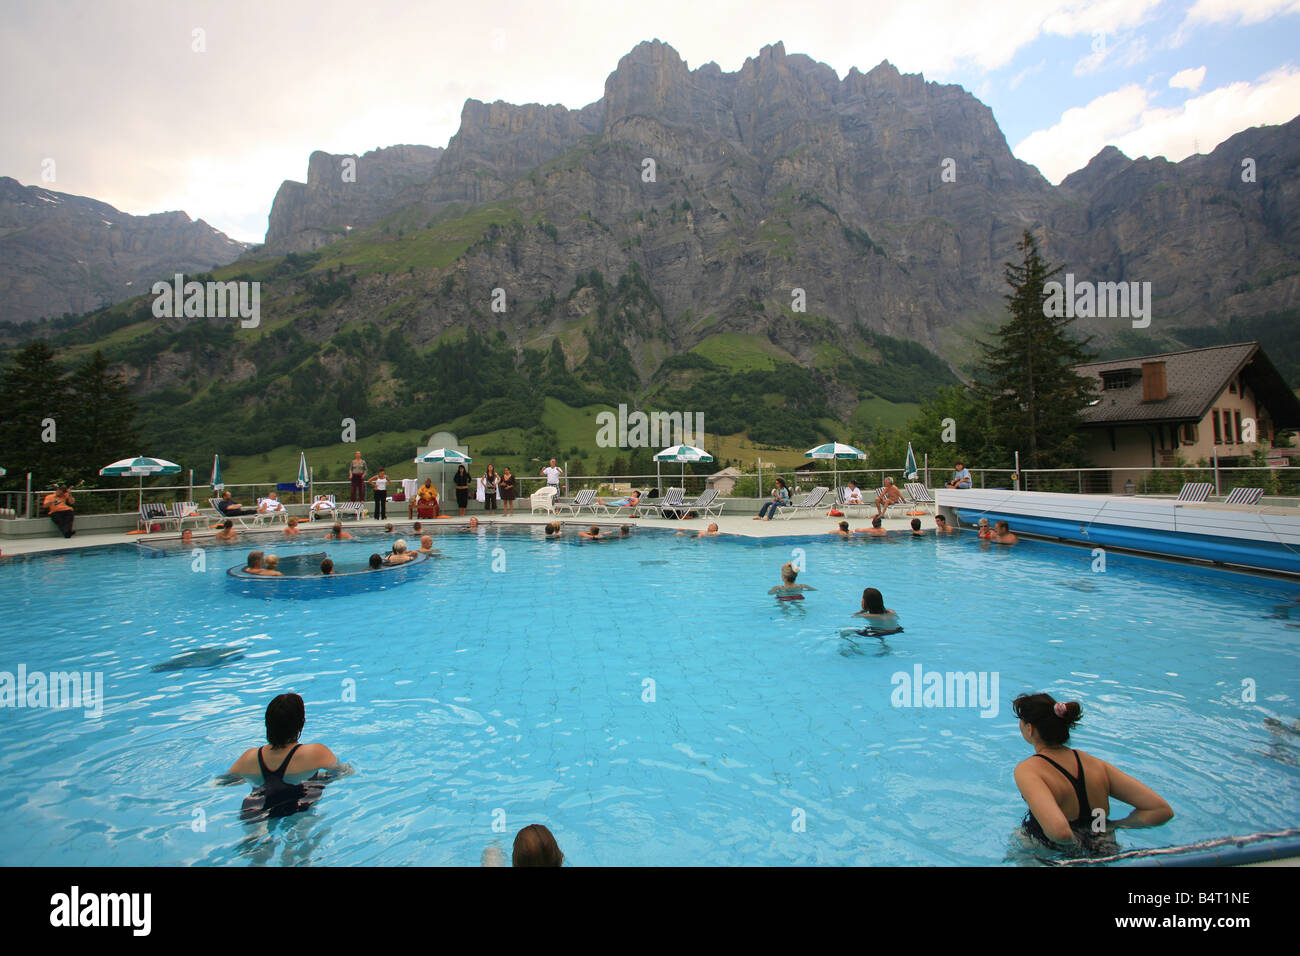 https://c8.alamy.com/compit/b4t1ne/bagni-termali-di-leukerbad-vallese-svizzera-europa-b4t1ne.jpg